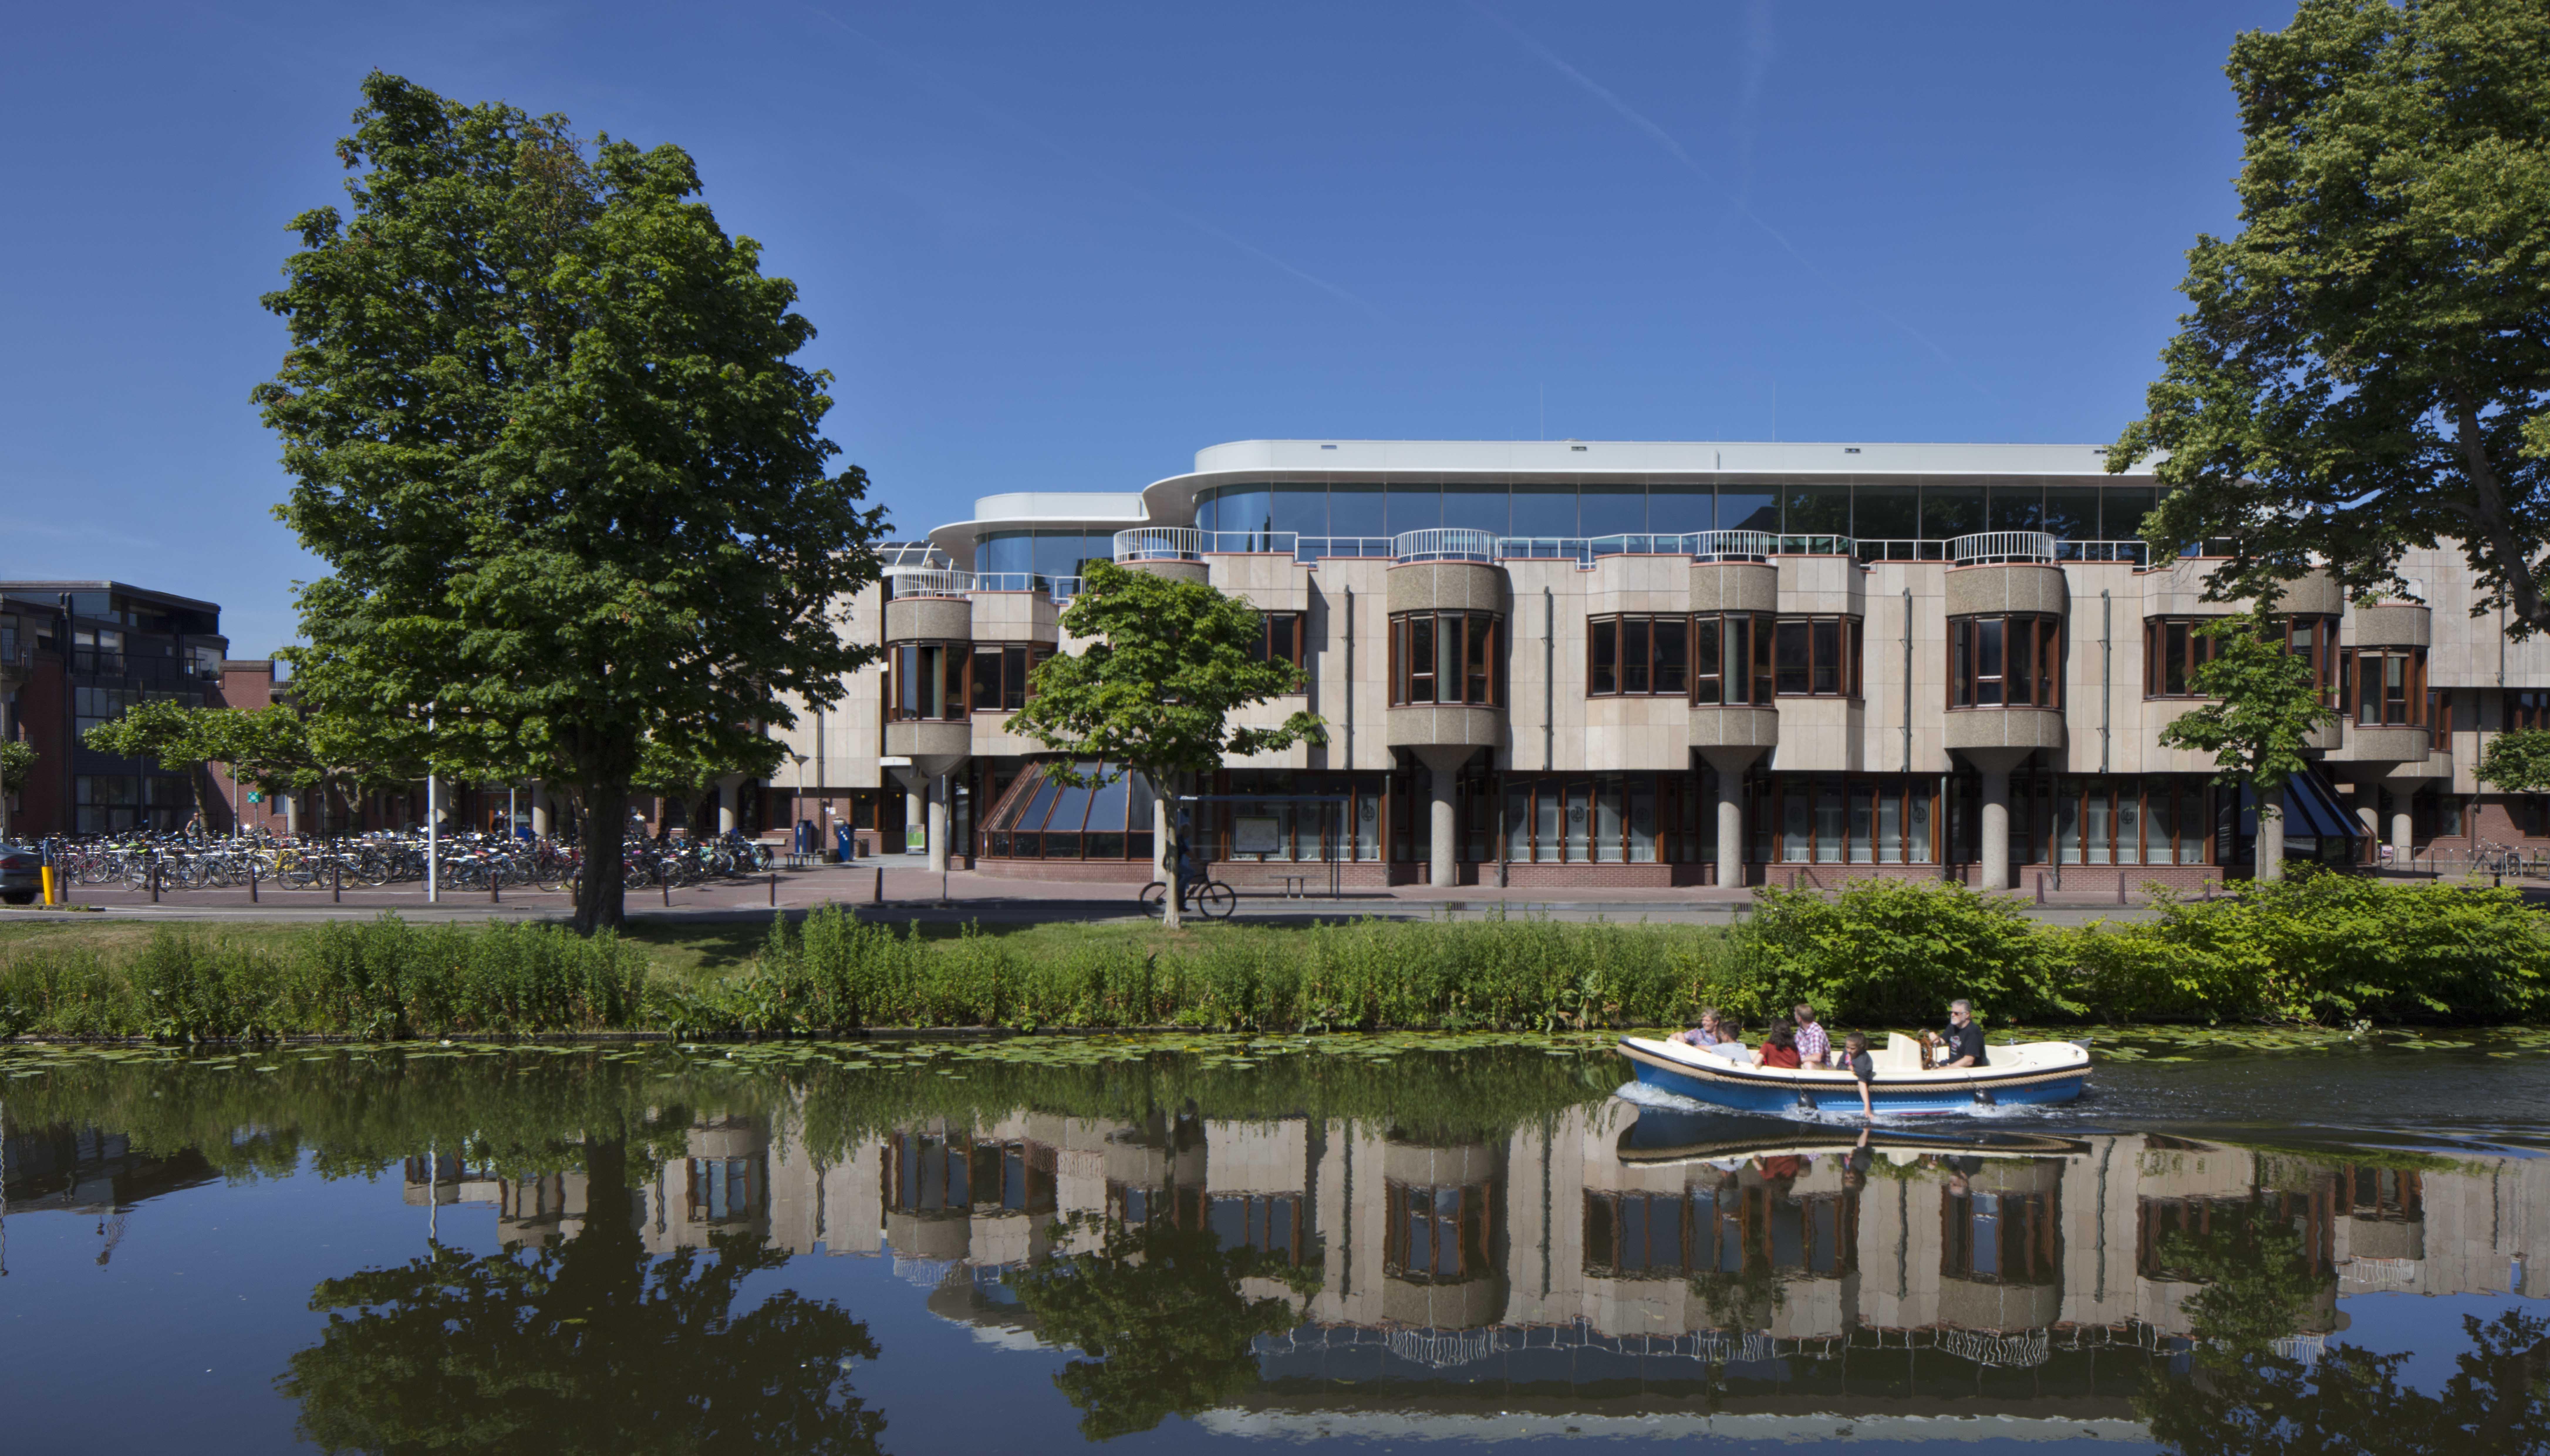 <p>Exterieur beeld Asian Library universiteitsbibliotheek Leiden. foto: Jeroen Musch</p>